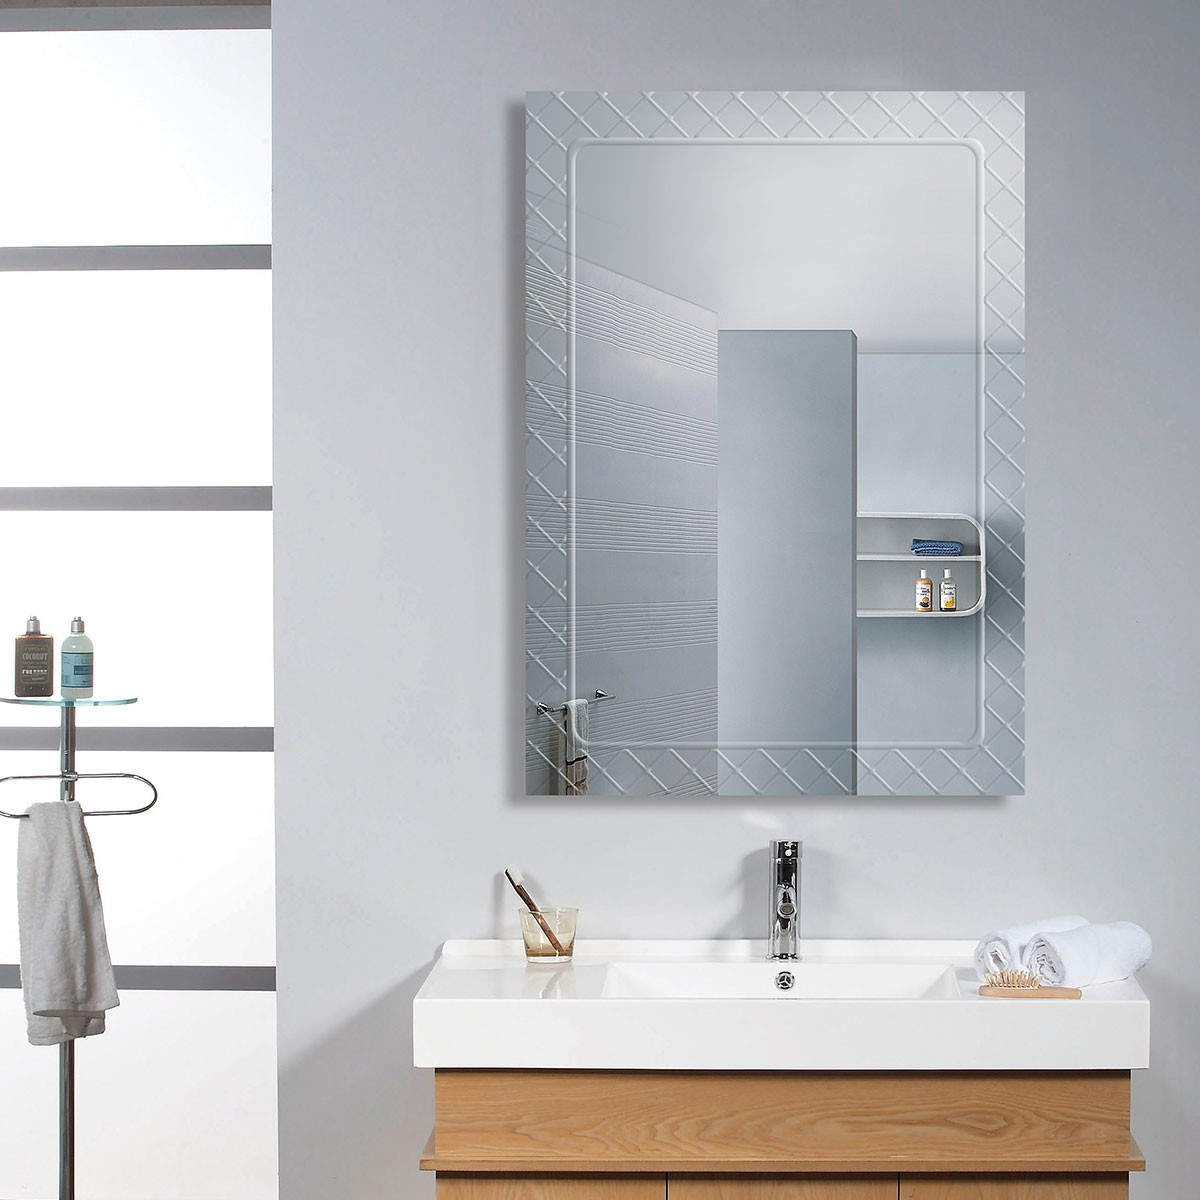 28 x 20 po miroir mural salle de bain classique for Miroir mural vertical